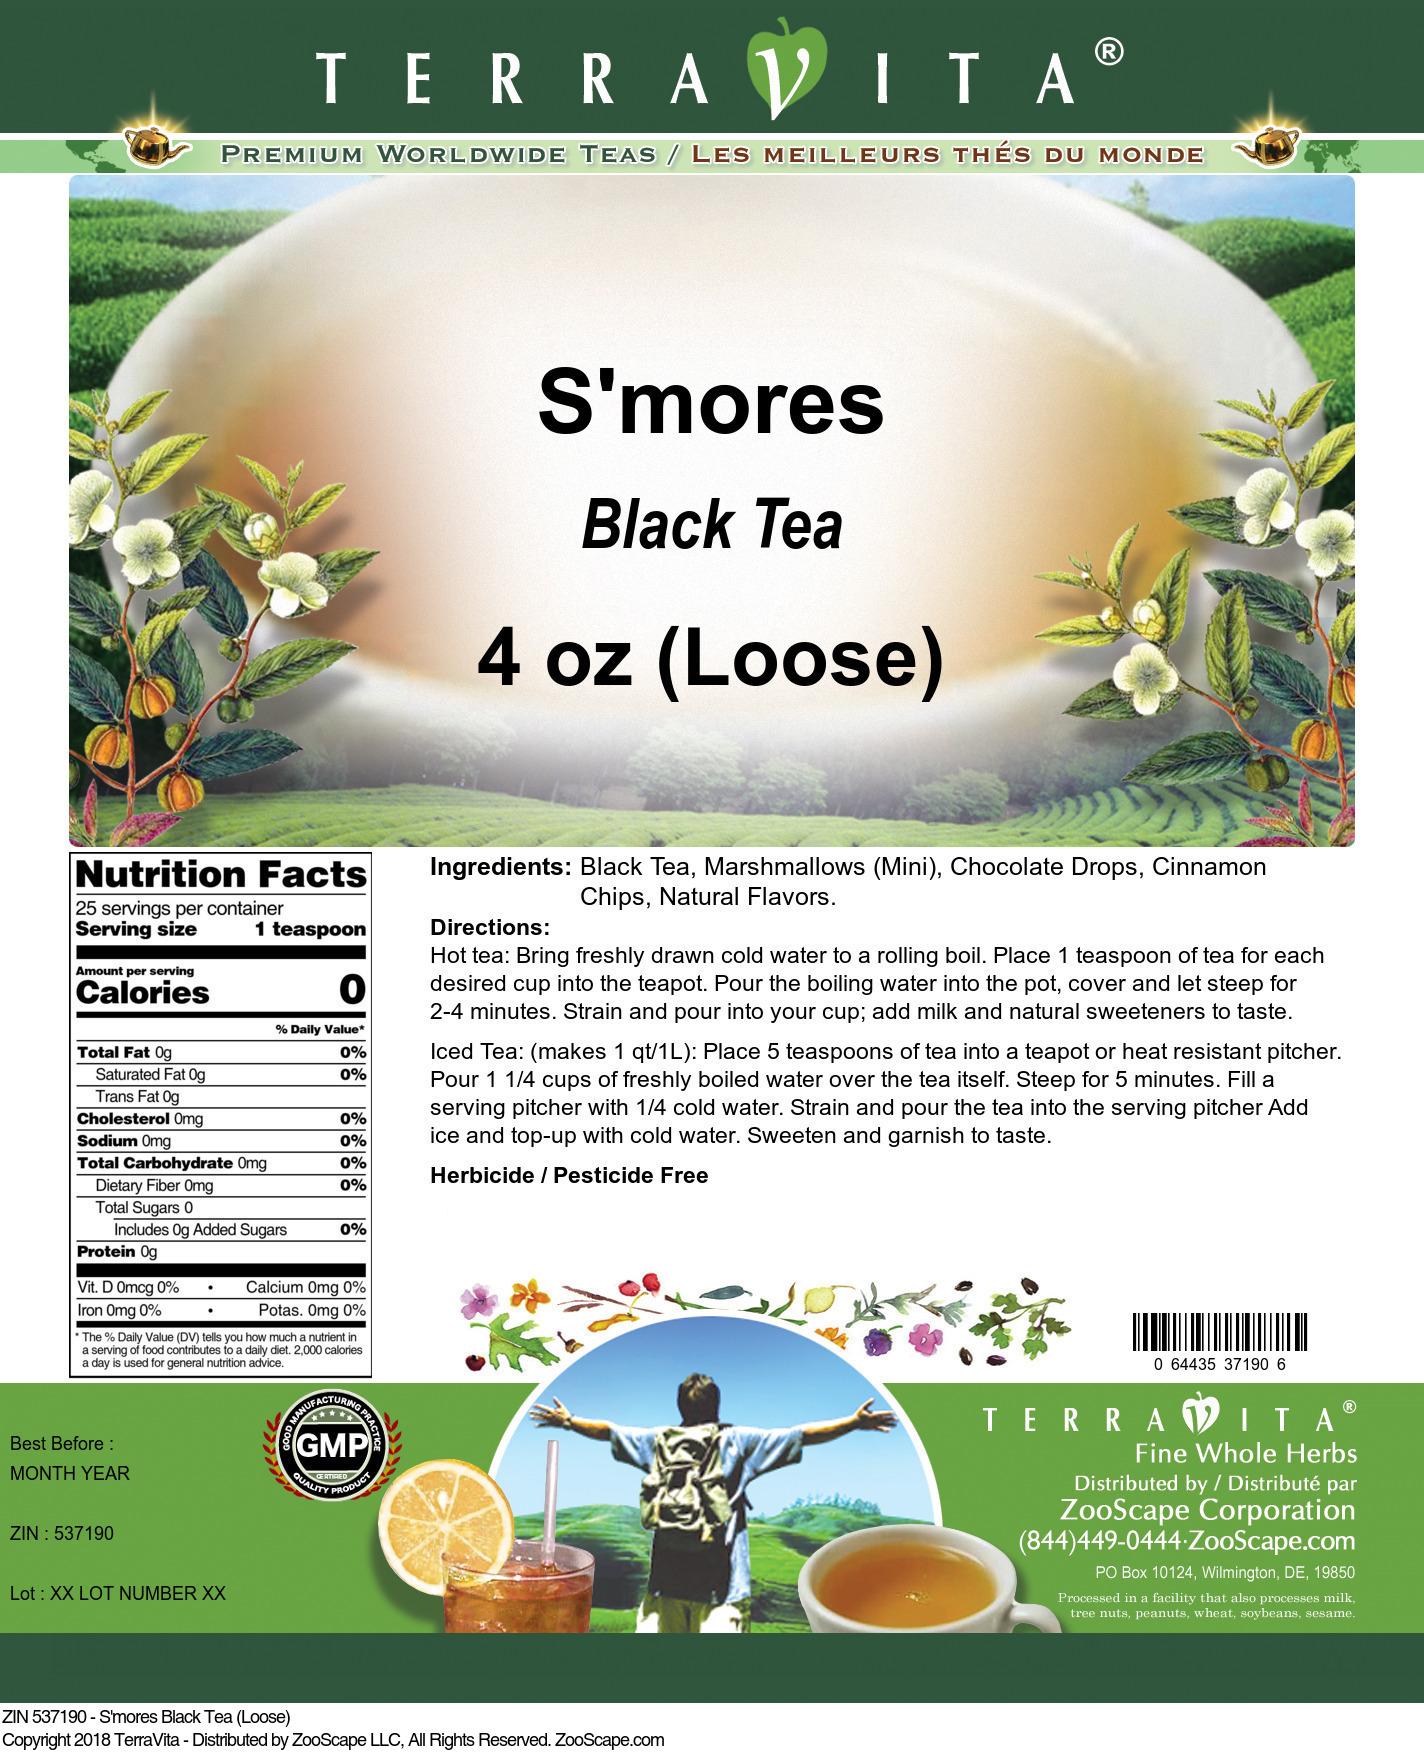 S'mores Black Tea (Loose)